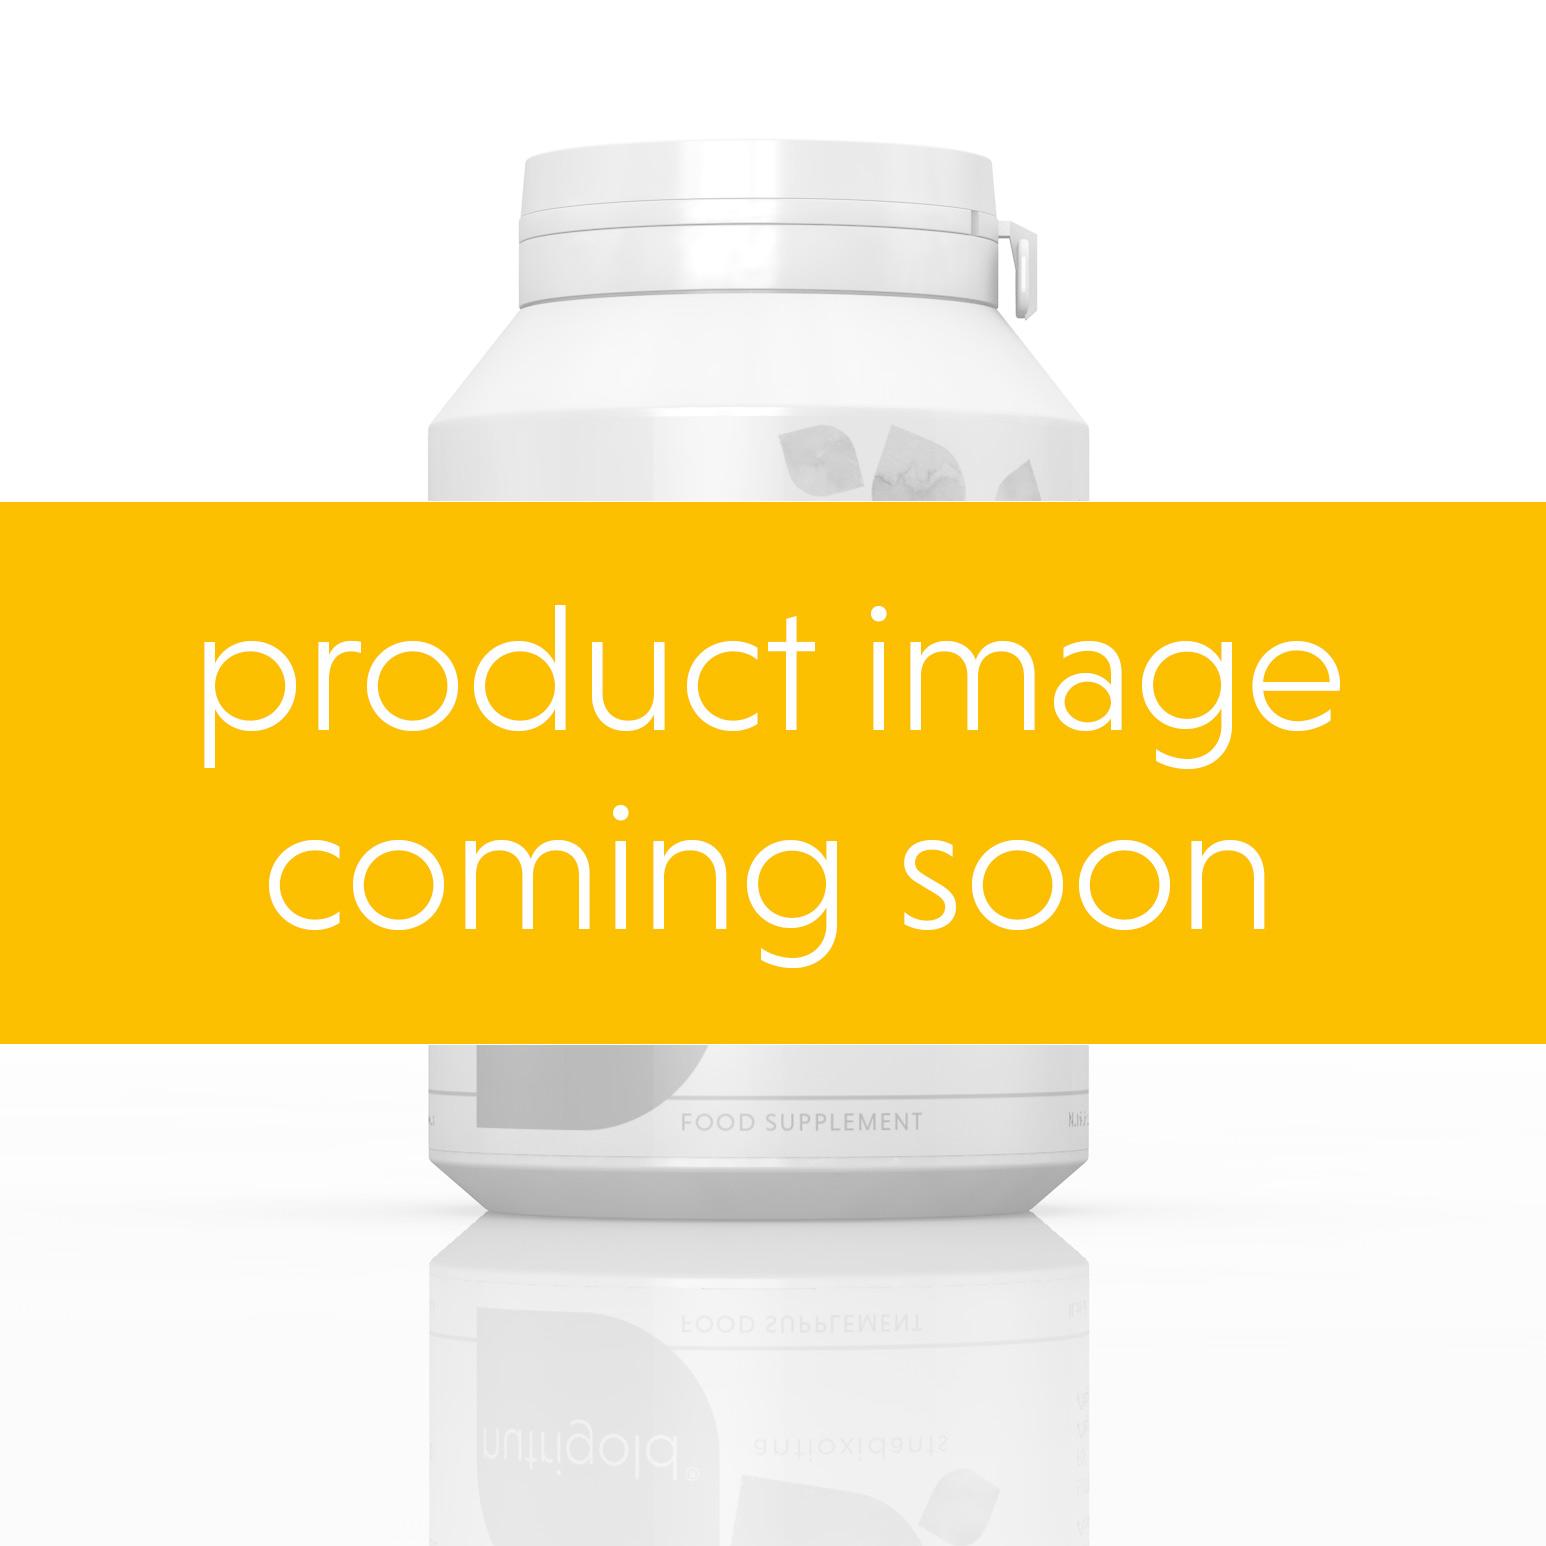 Superlec Granules * Short Shelf Life 01/10/18*